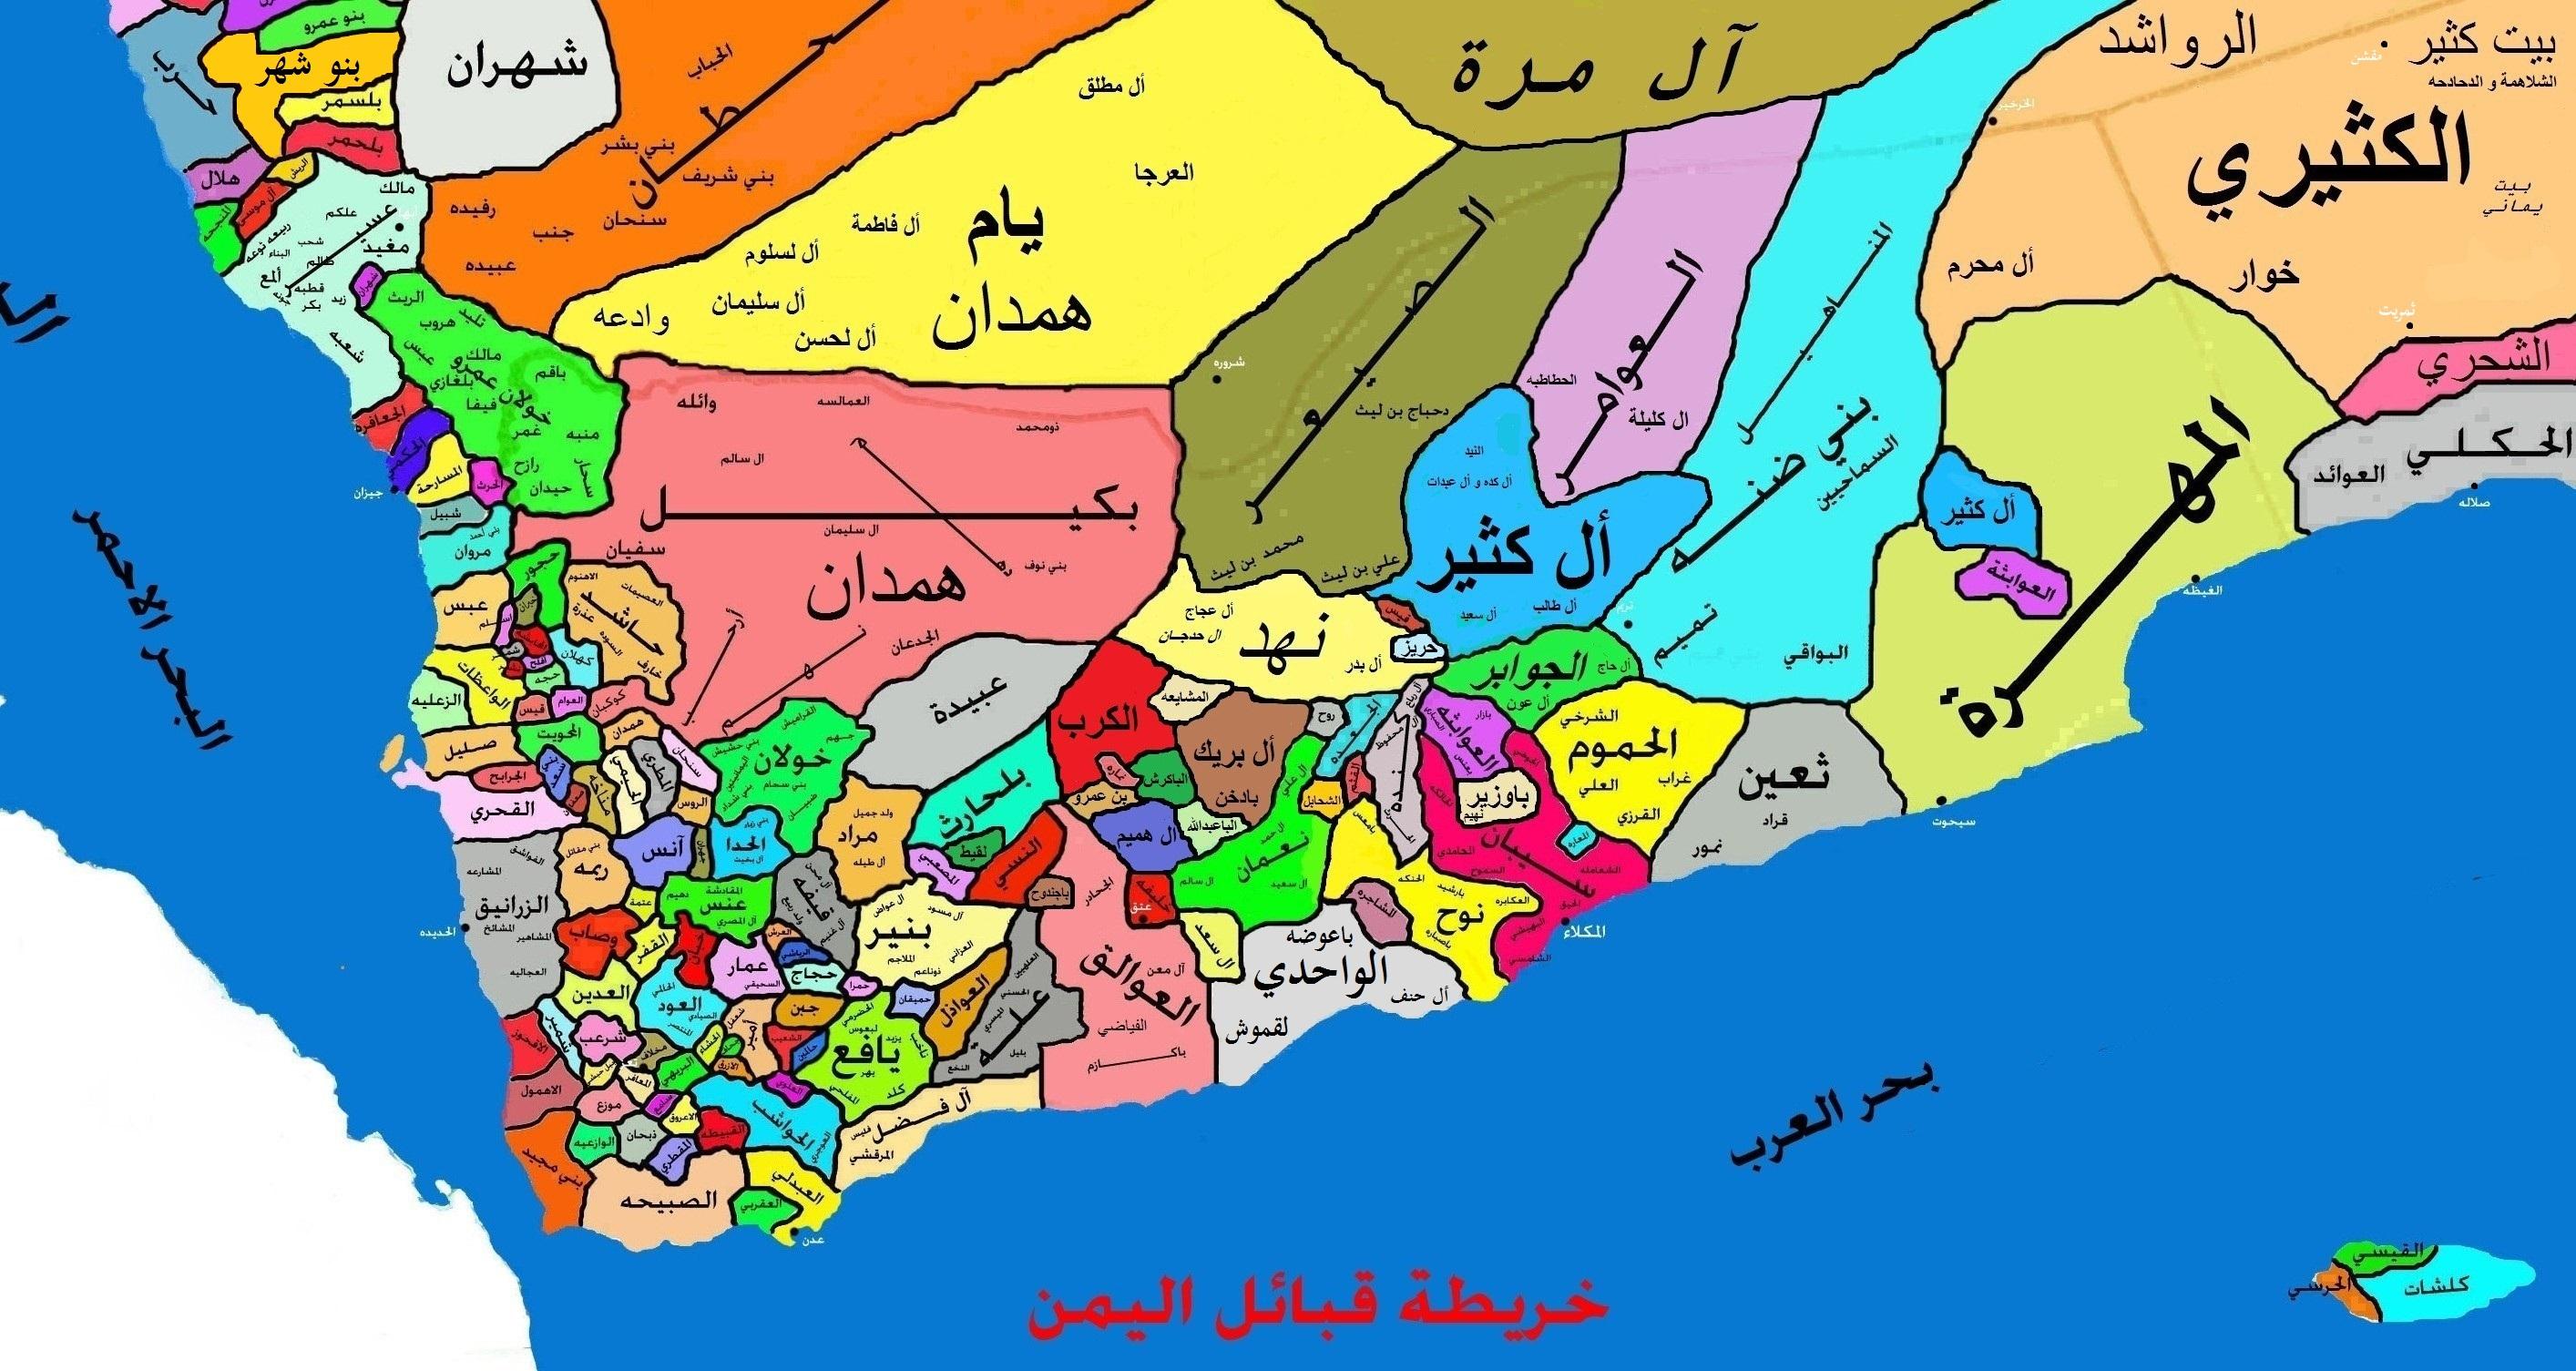 File خريطة قبائل اليمن و خريطة حدود القبائل اليمنية Jpg